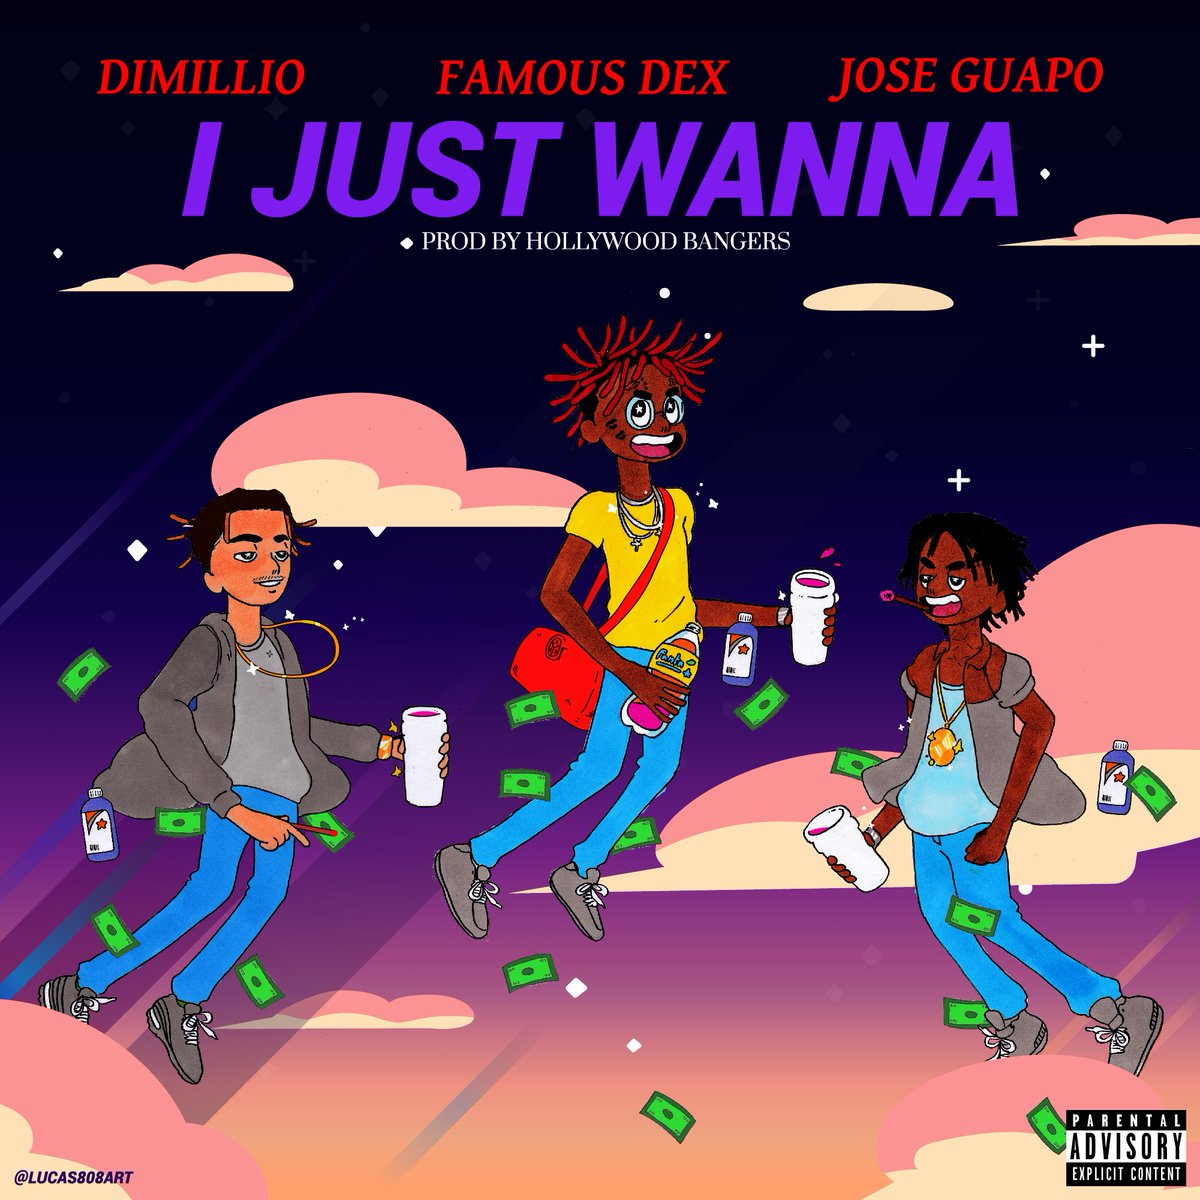 New Music: Dimillio – I Just Wanna (Ft. Famous Dex & Jose Guapo)